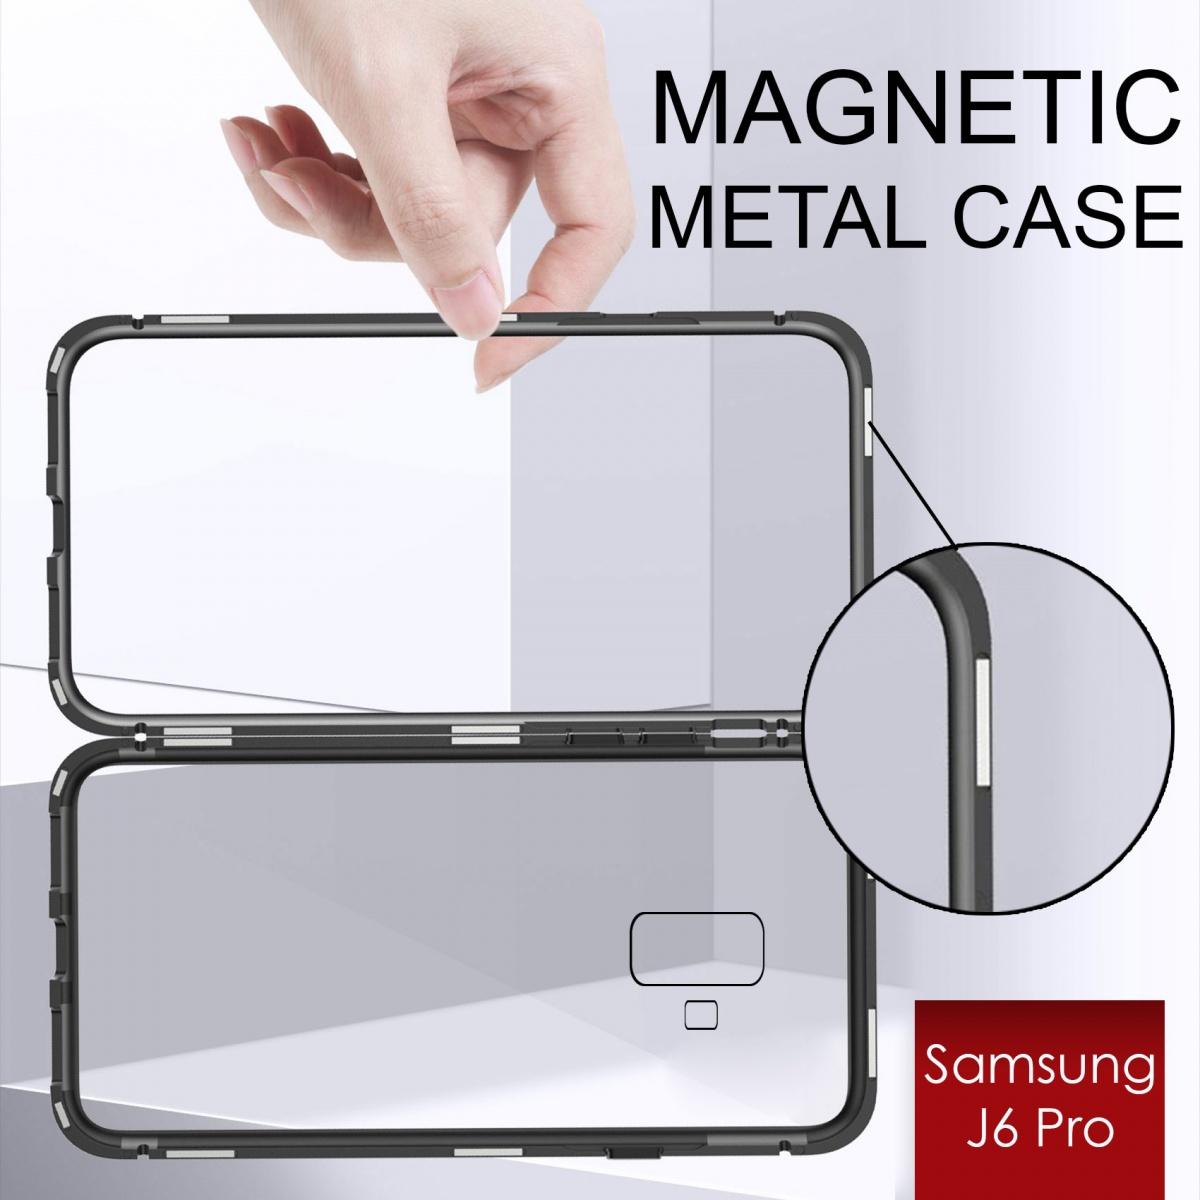 Samsung Galaxy J6 Pro Magnetic Metal Flip Phone Case - Black